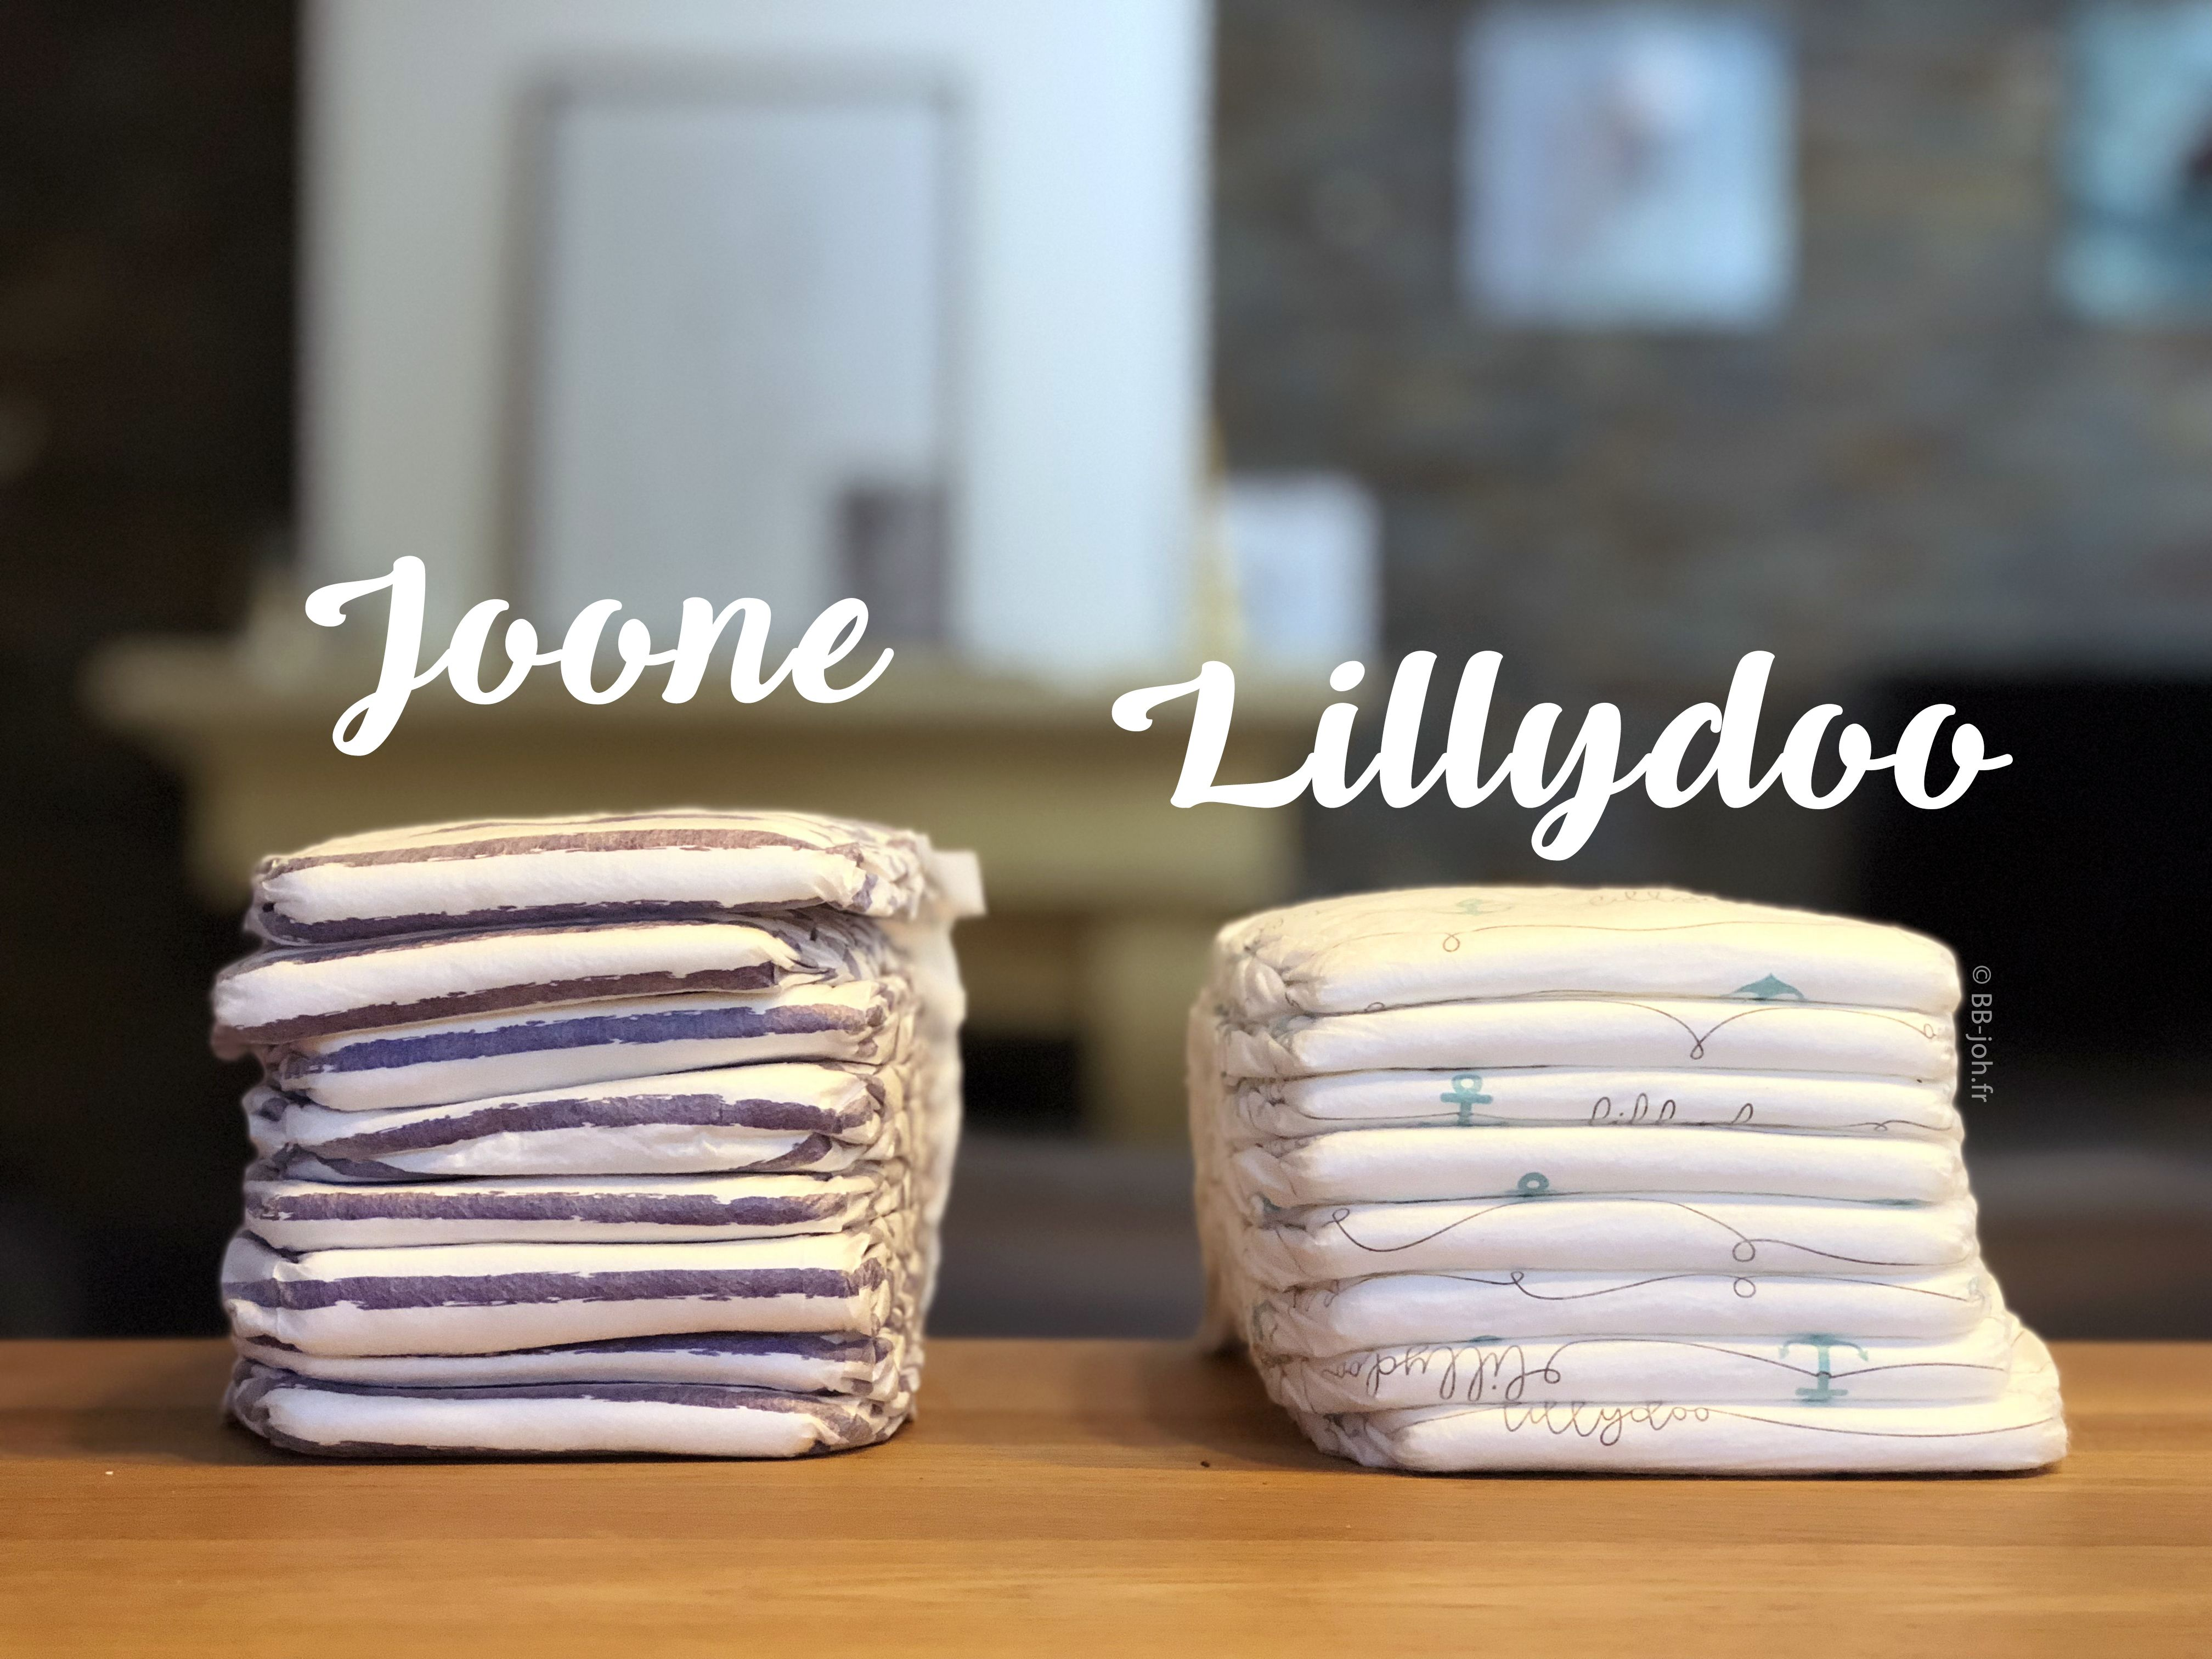 Lillydoo Vs Joone Test Des Couches En Abonnement Baby Mom Beauty